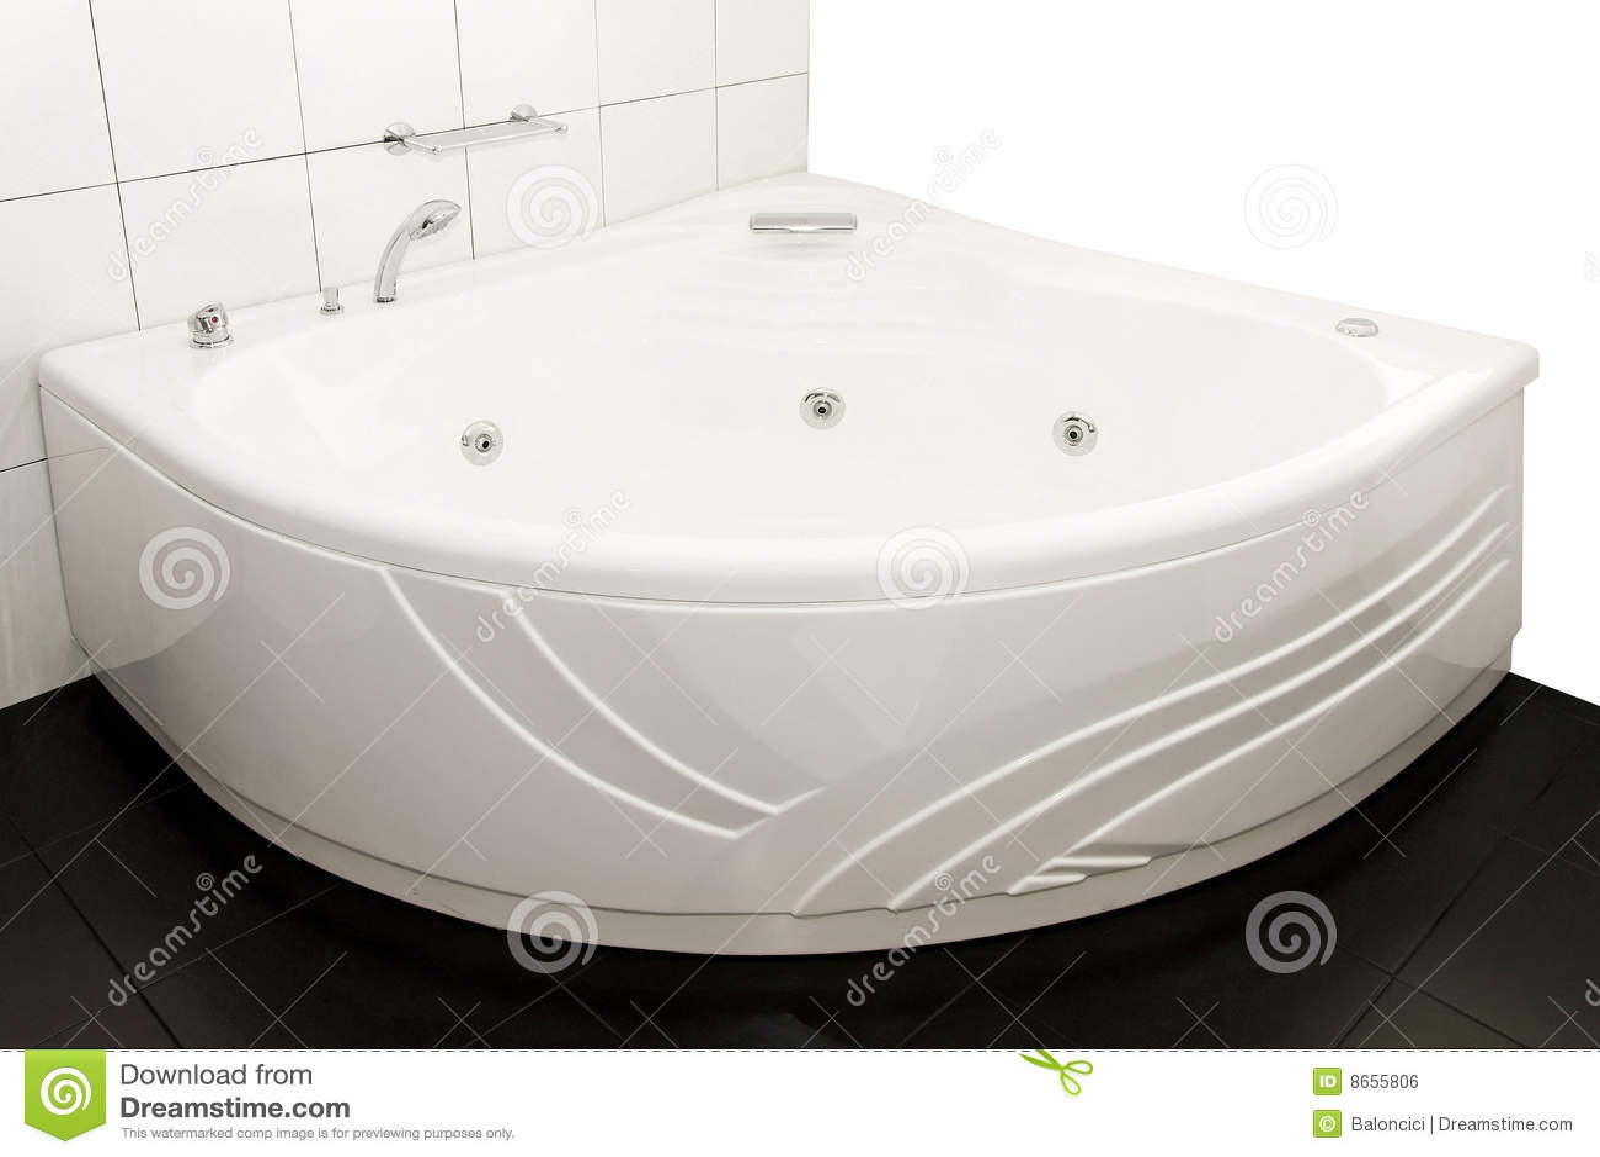 Grande vasca da bagno immagine stock libera da diritti - Vasca da bagno grande ...